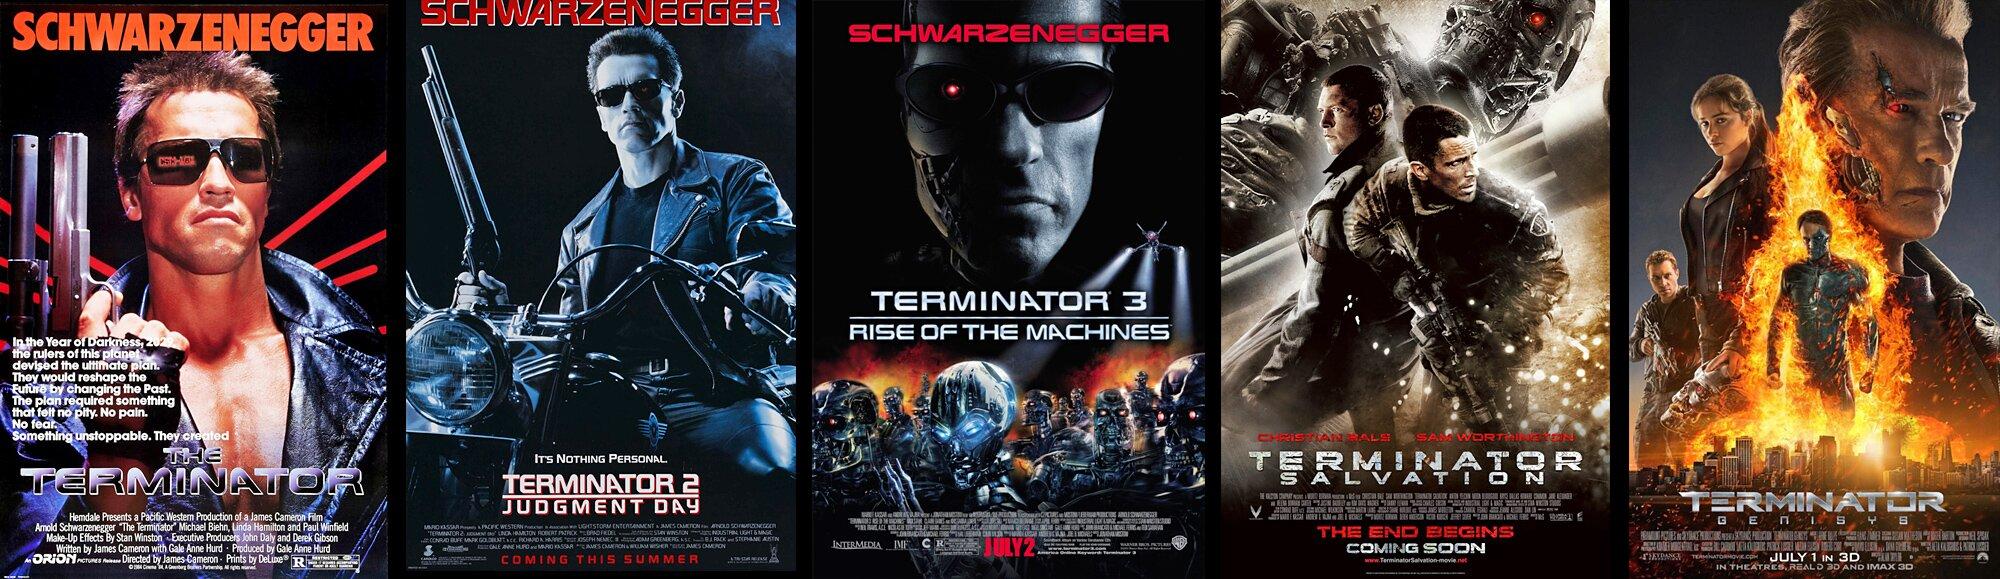 Terminator Genisys': The franchise timeline, explained | EW.com